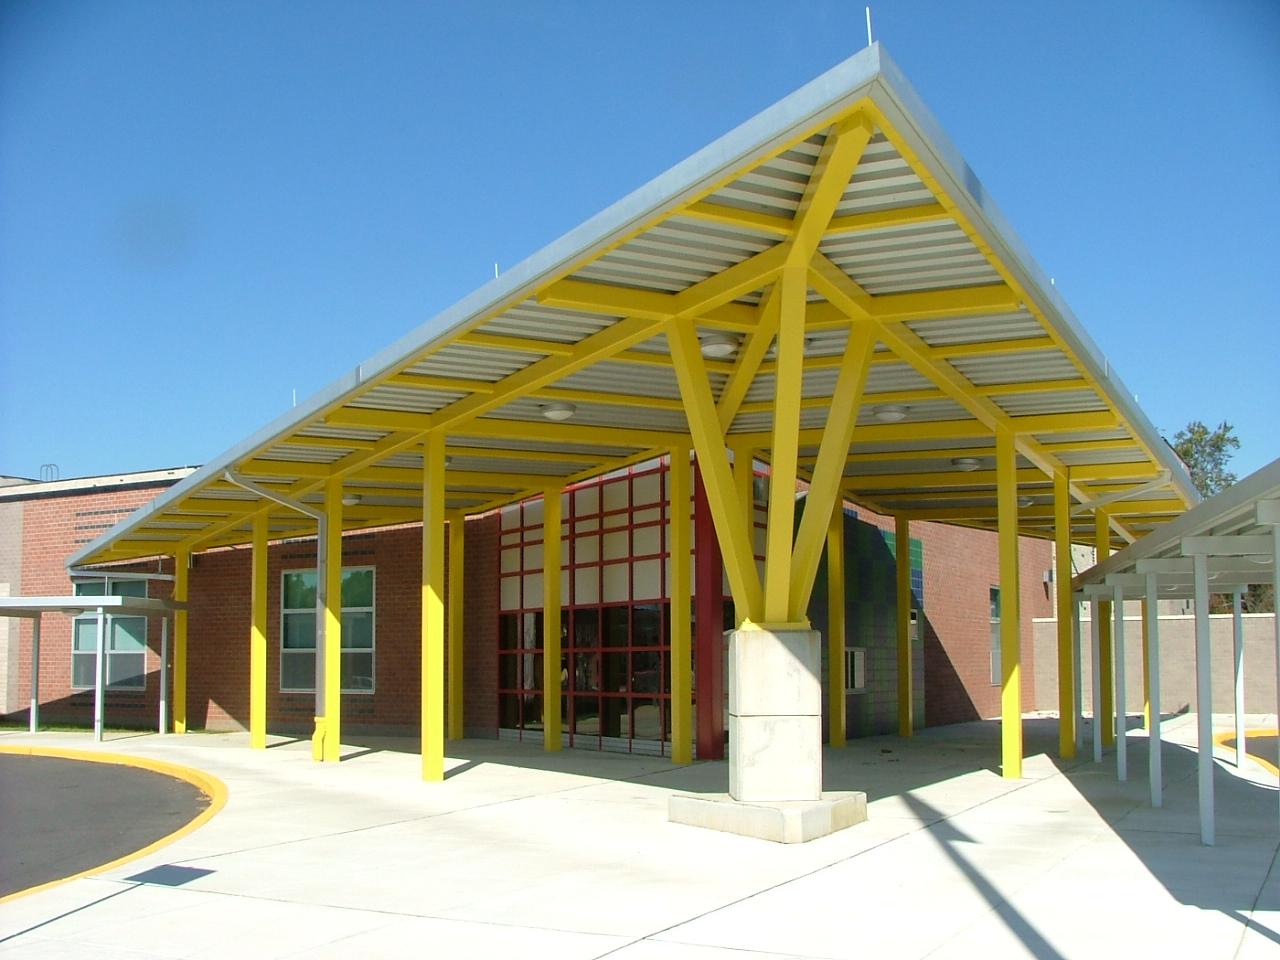 North Hanover New Upper Elementary School